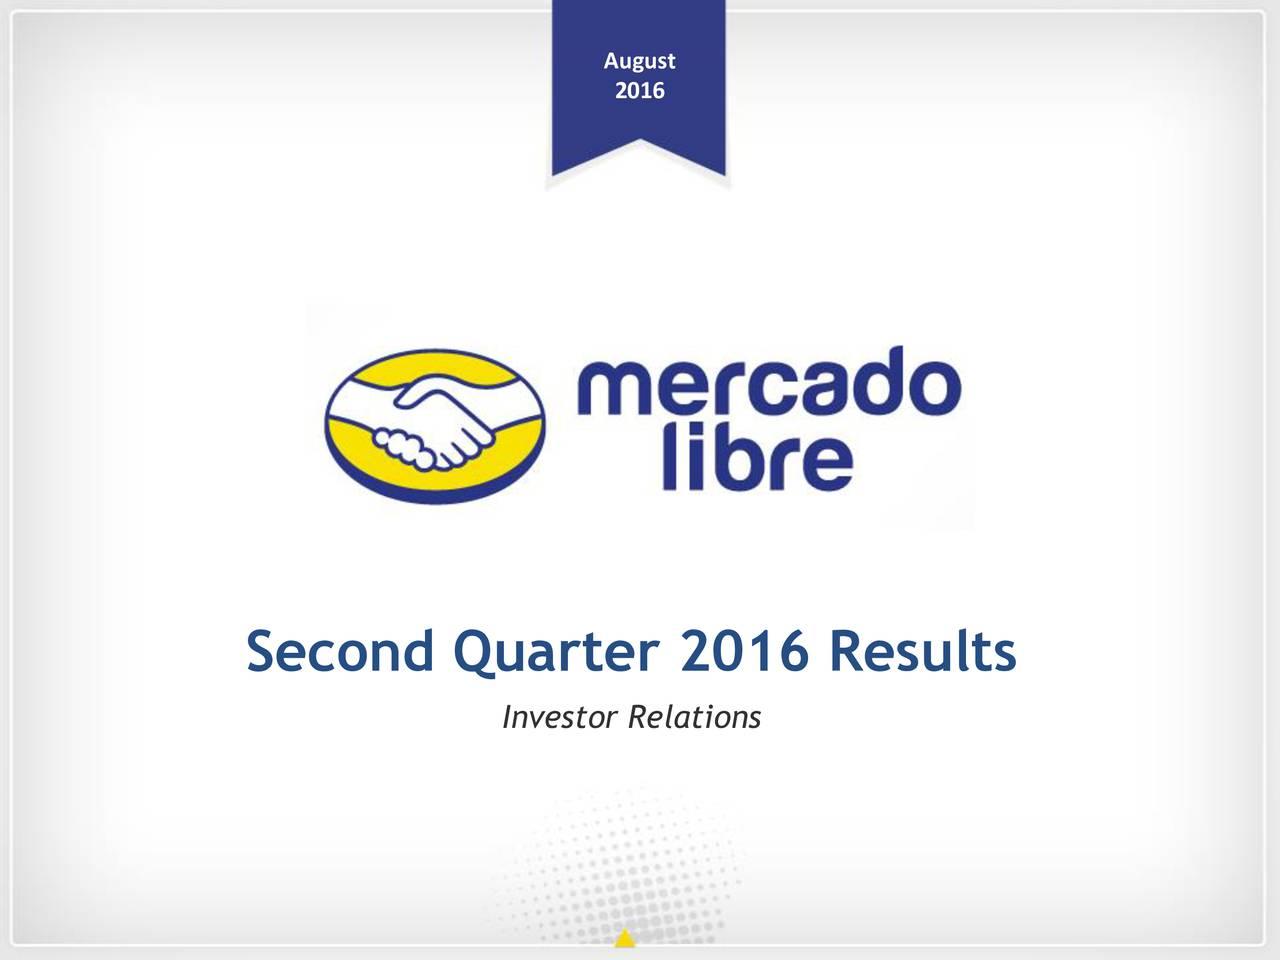 2016 Second Quarter 2016 Results Investor Relations